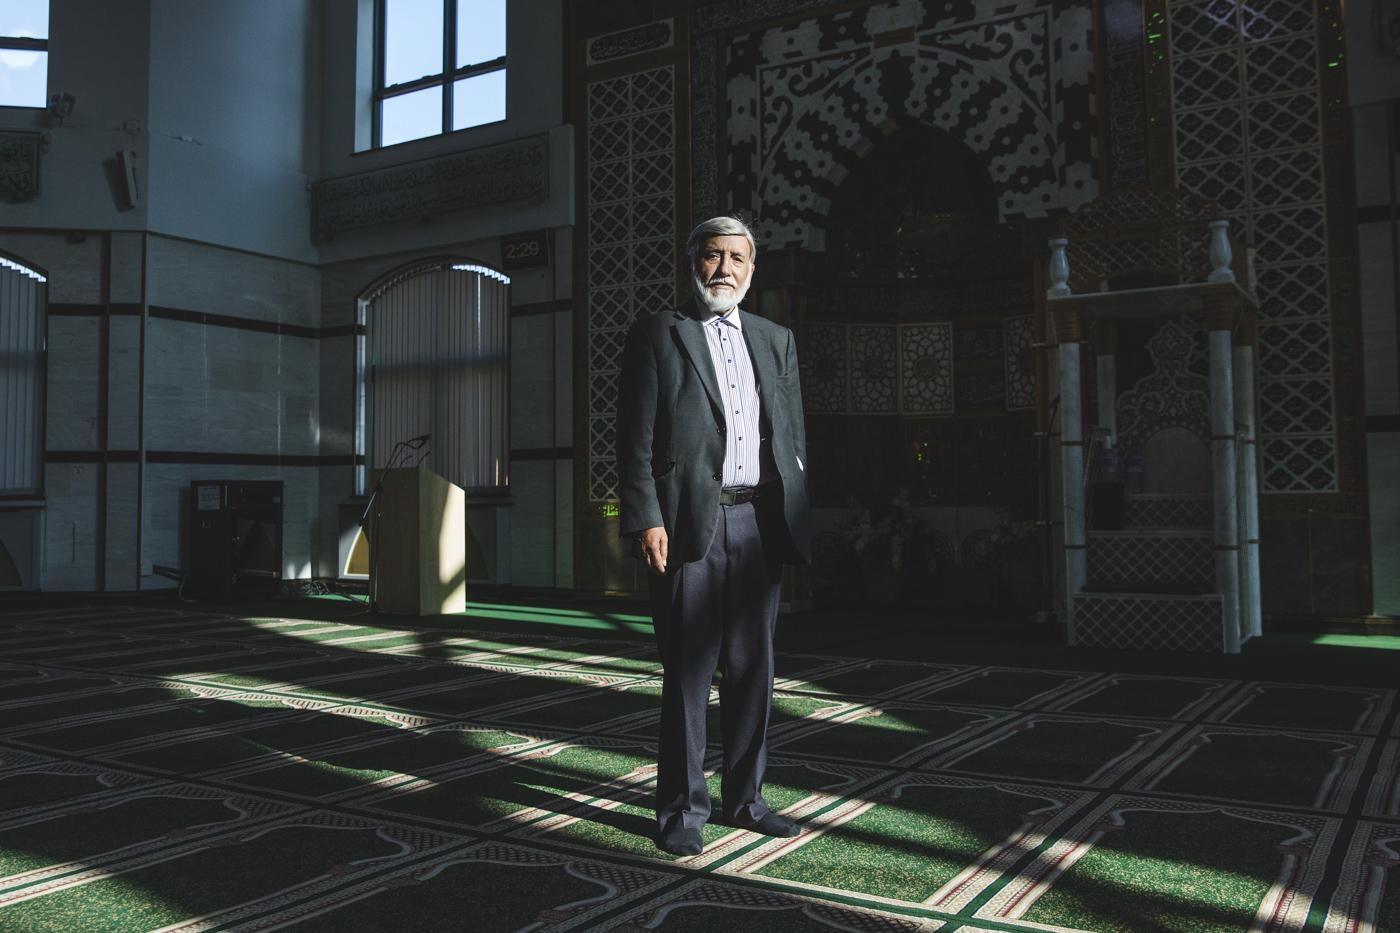 Abdul M. Choudhuri, Chairman of the Faizan-e-Madinah Masjid